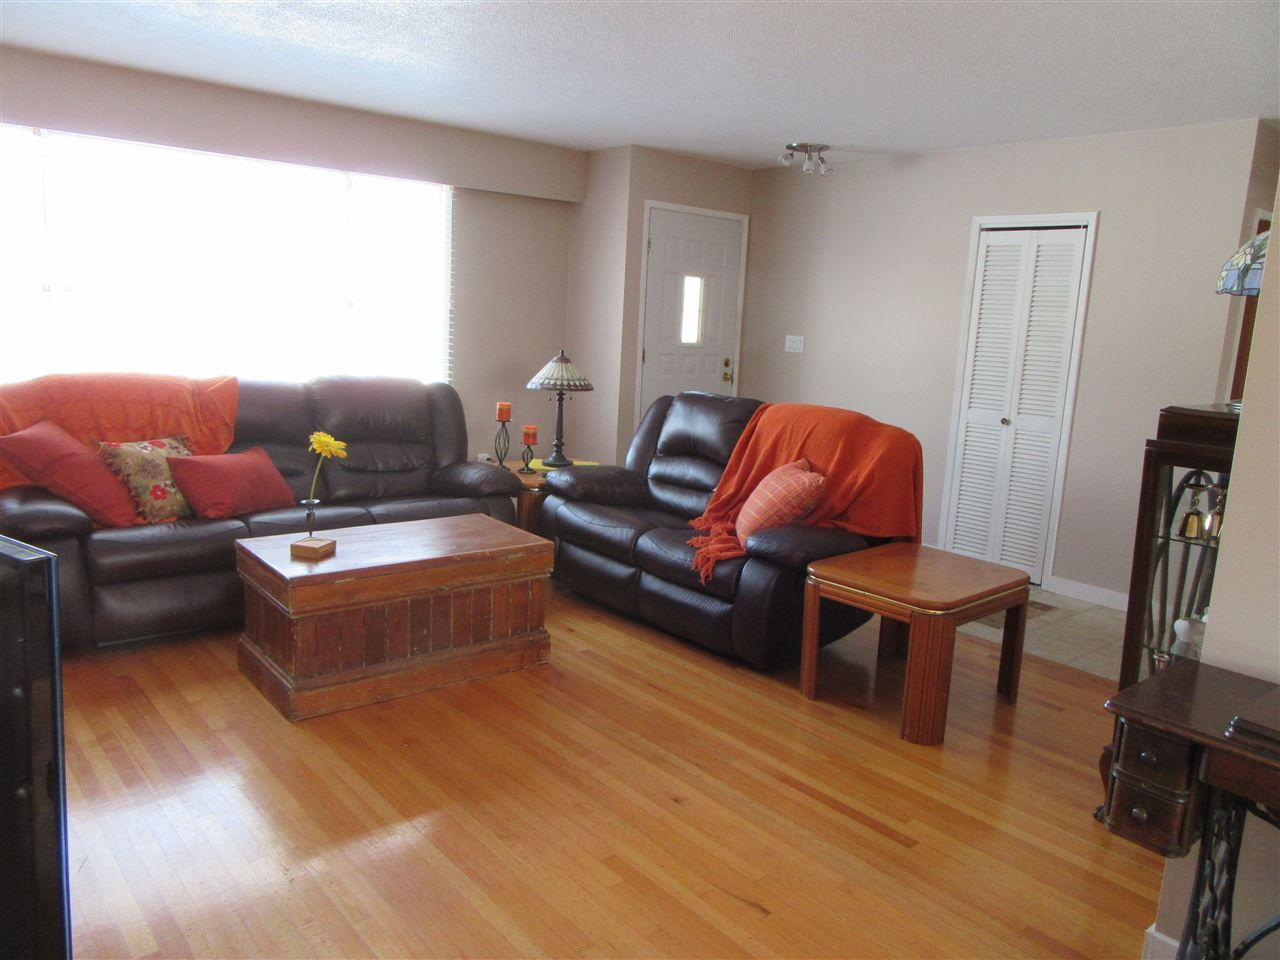 Photo 3: Photos: 522 RADCLIFFE Drive: Quinson House for sale (PG City West (Zone 71))  : MLS®# R2433646